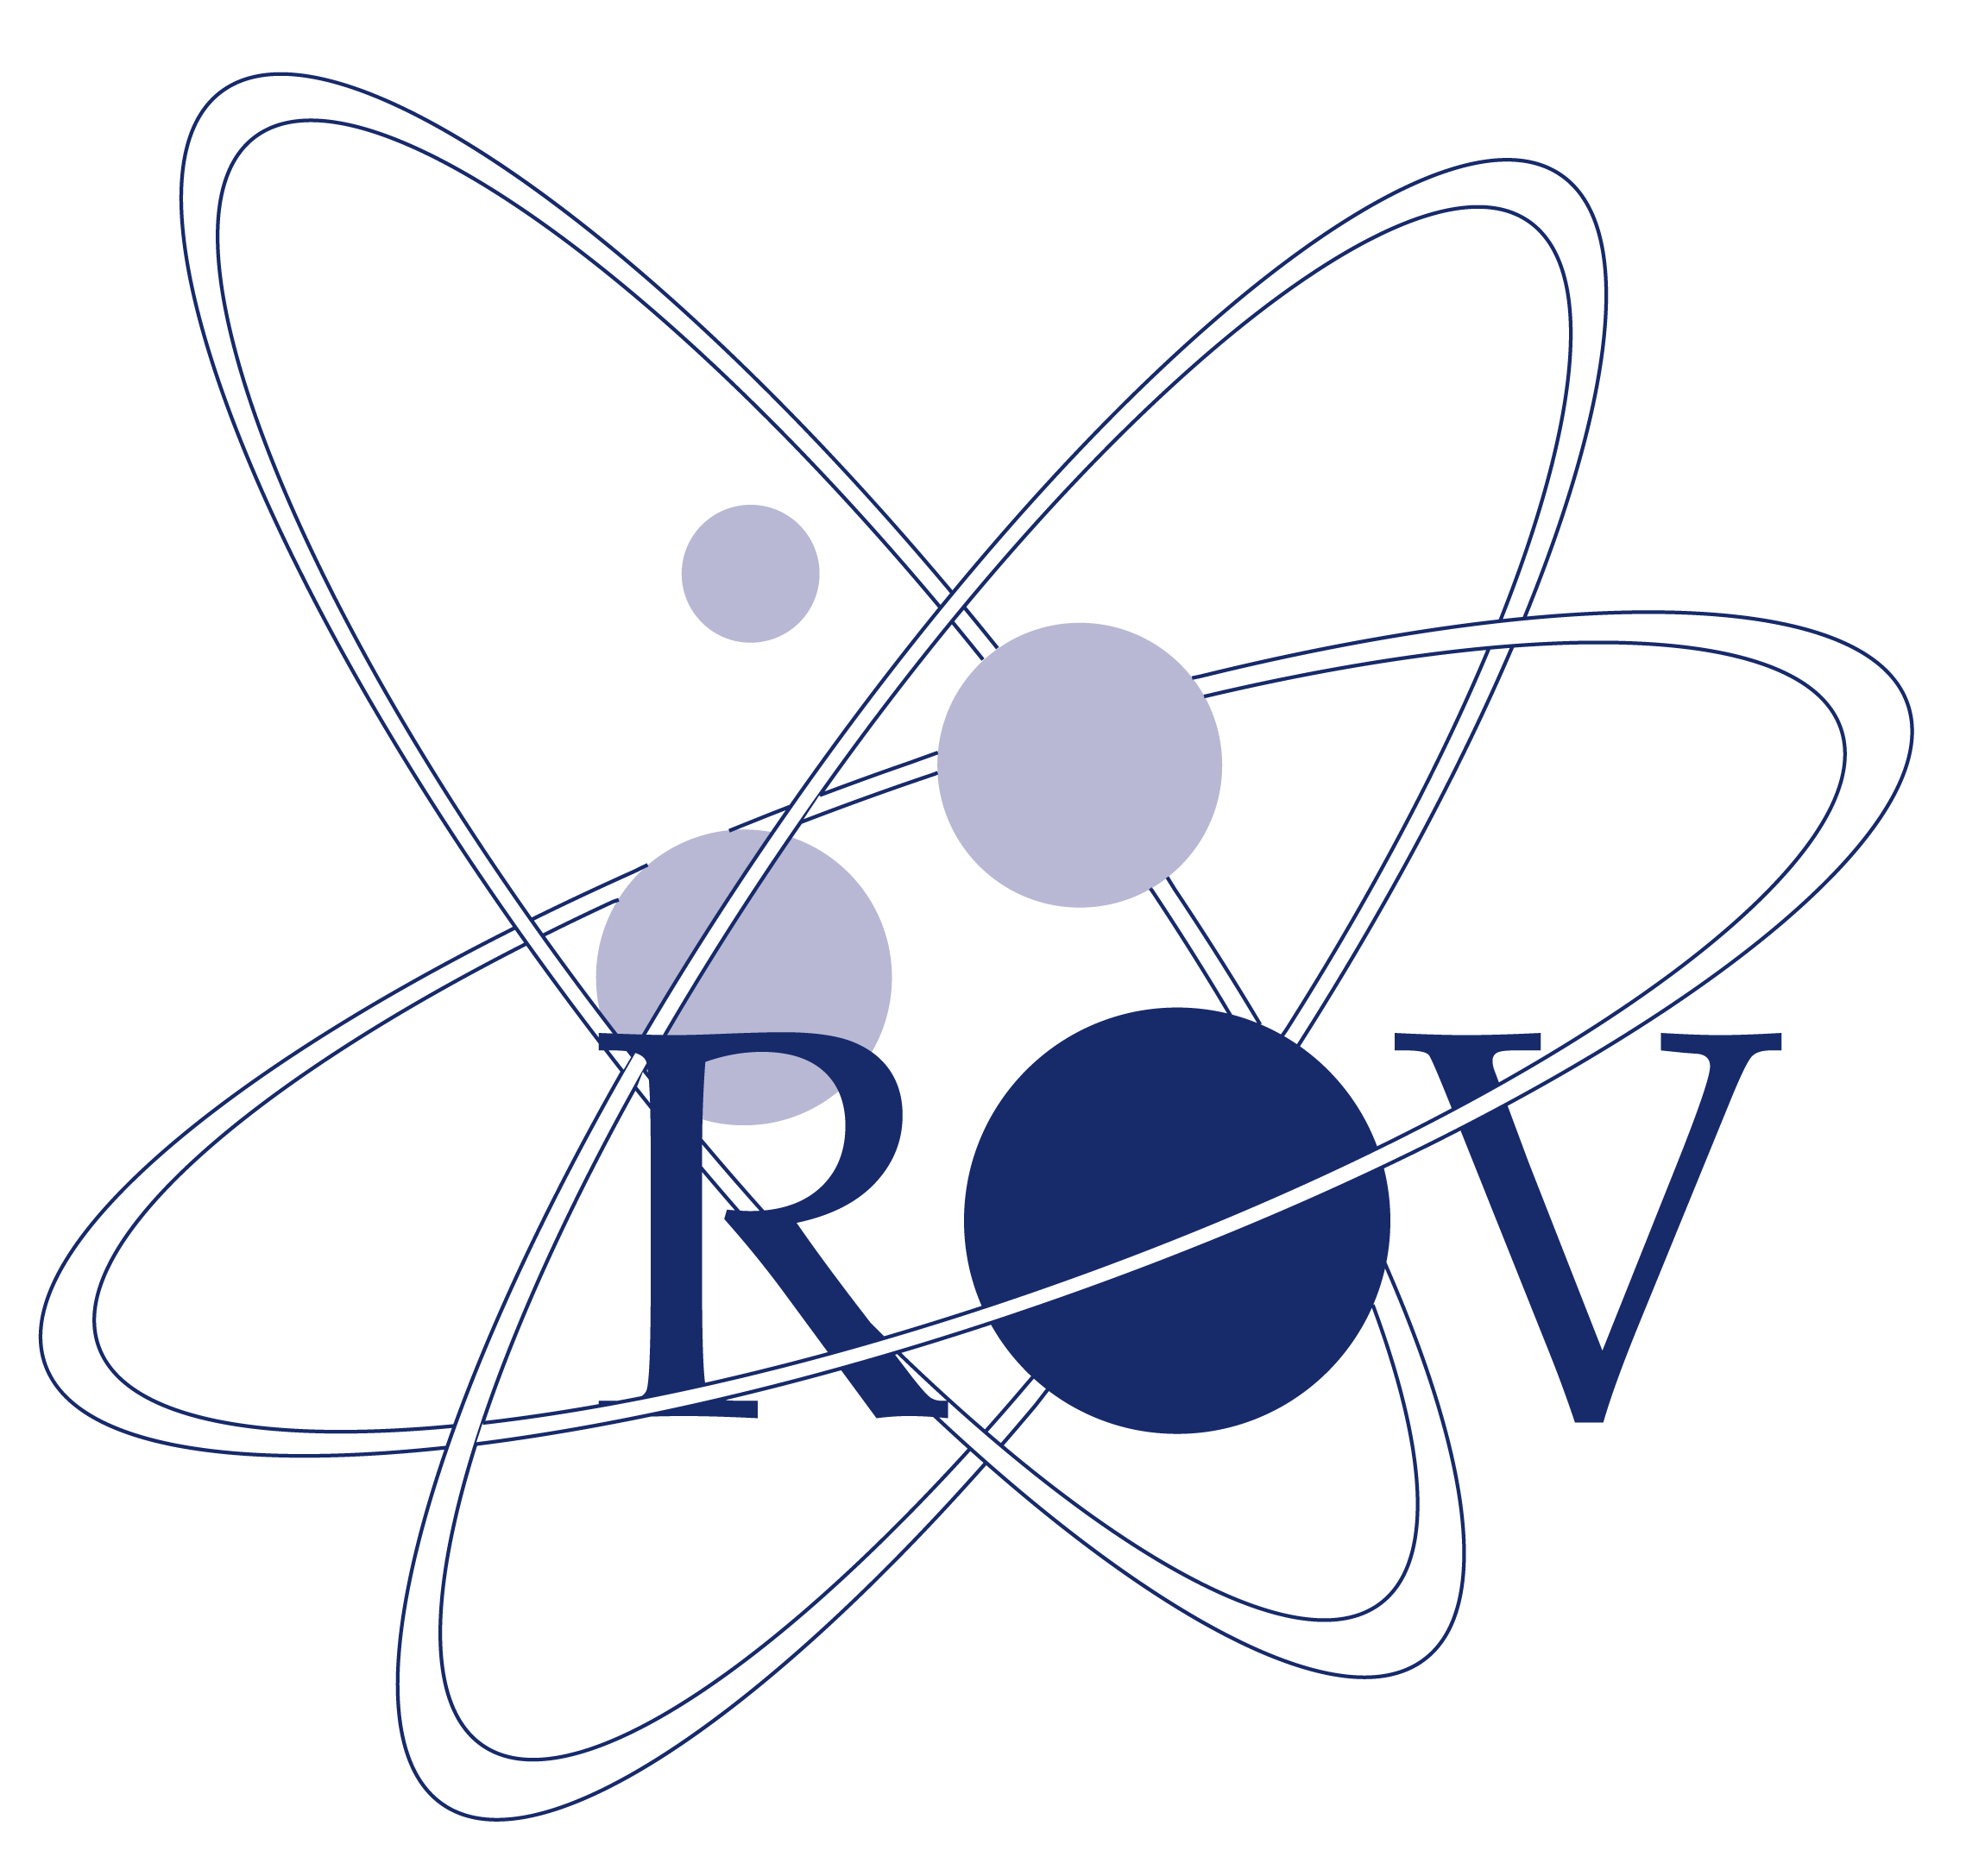 Radiation Oncology Victoria (ROV).